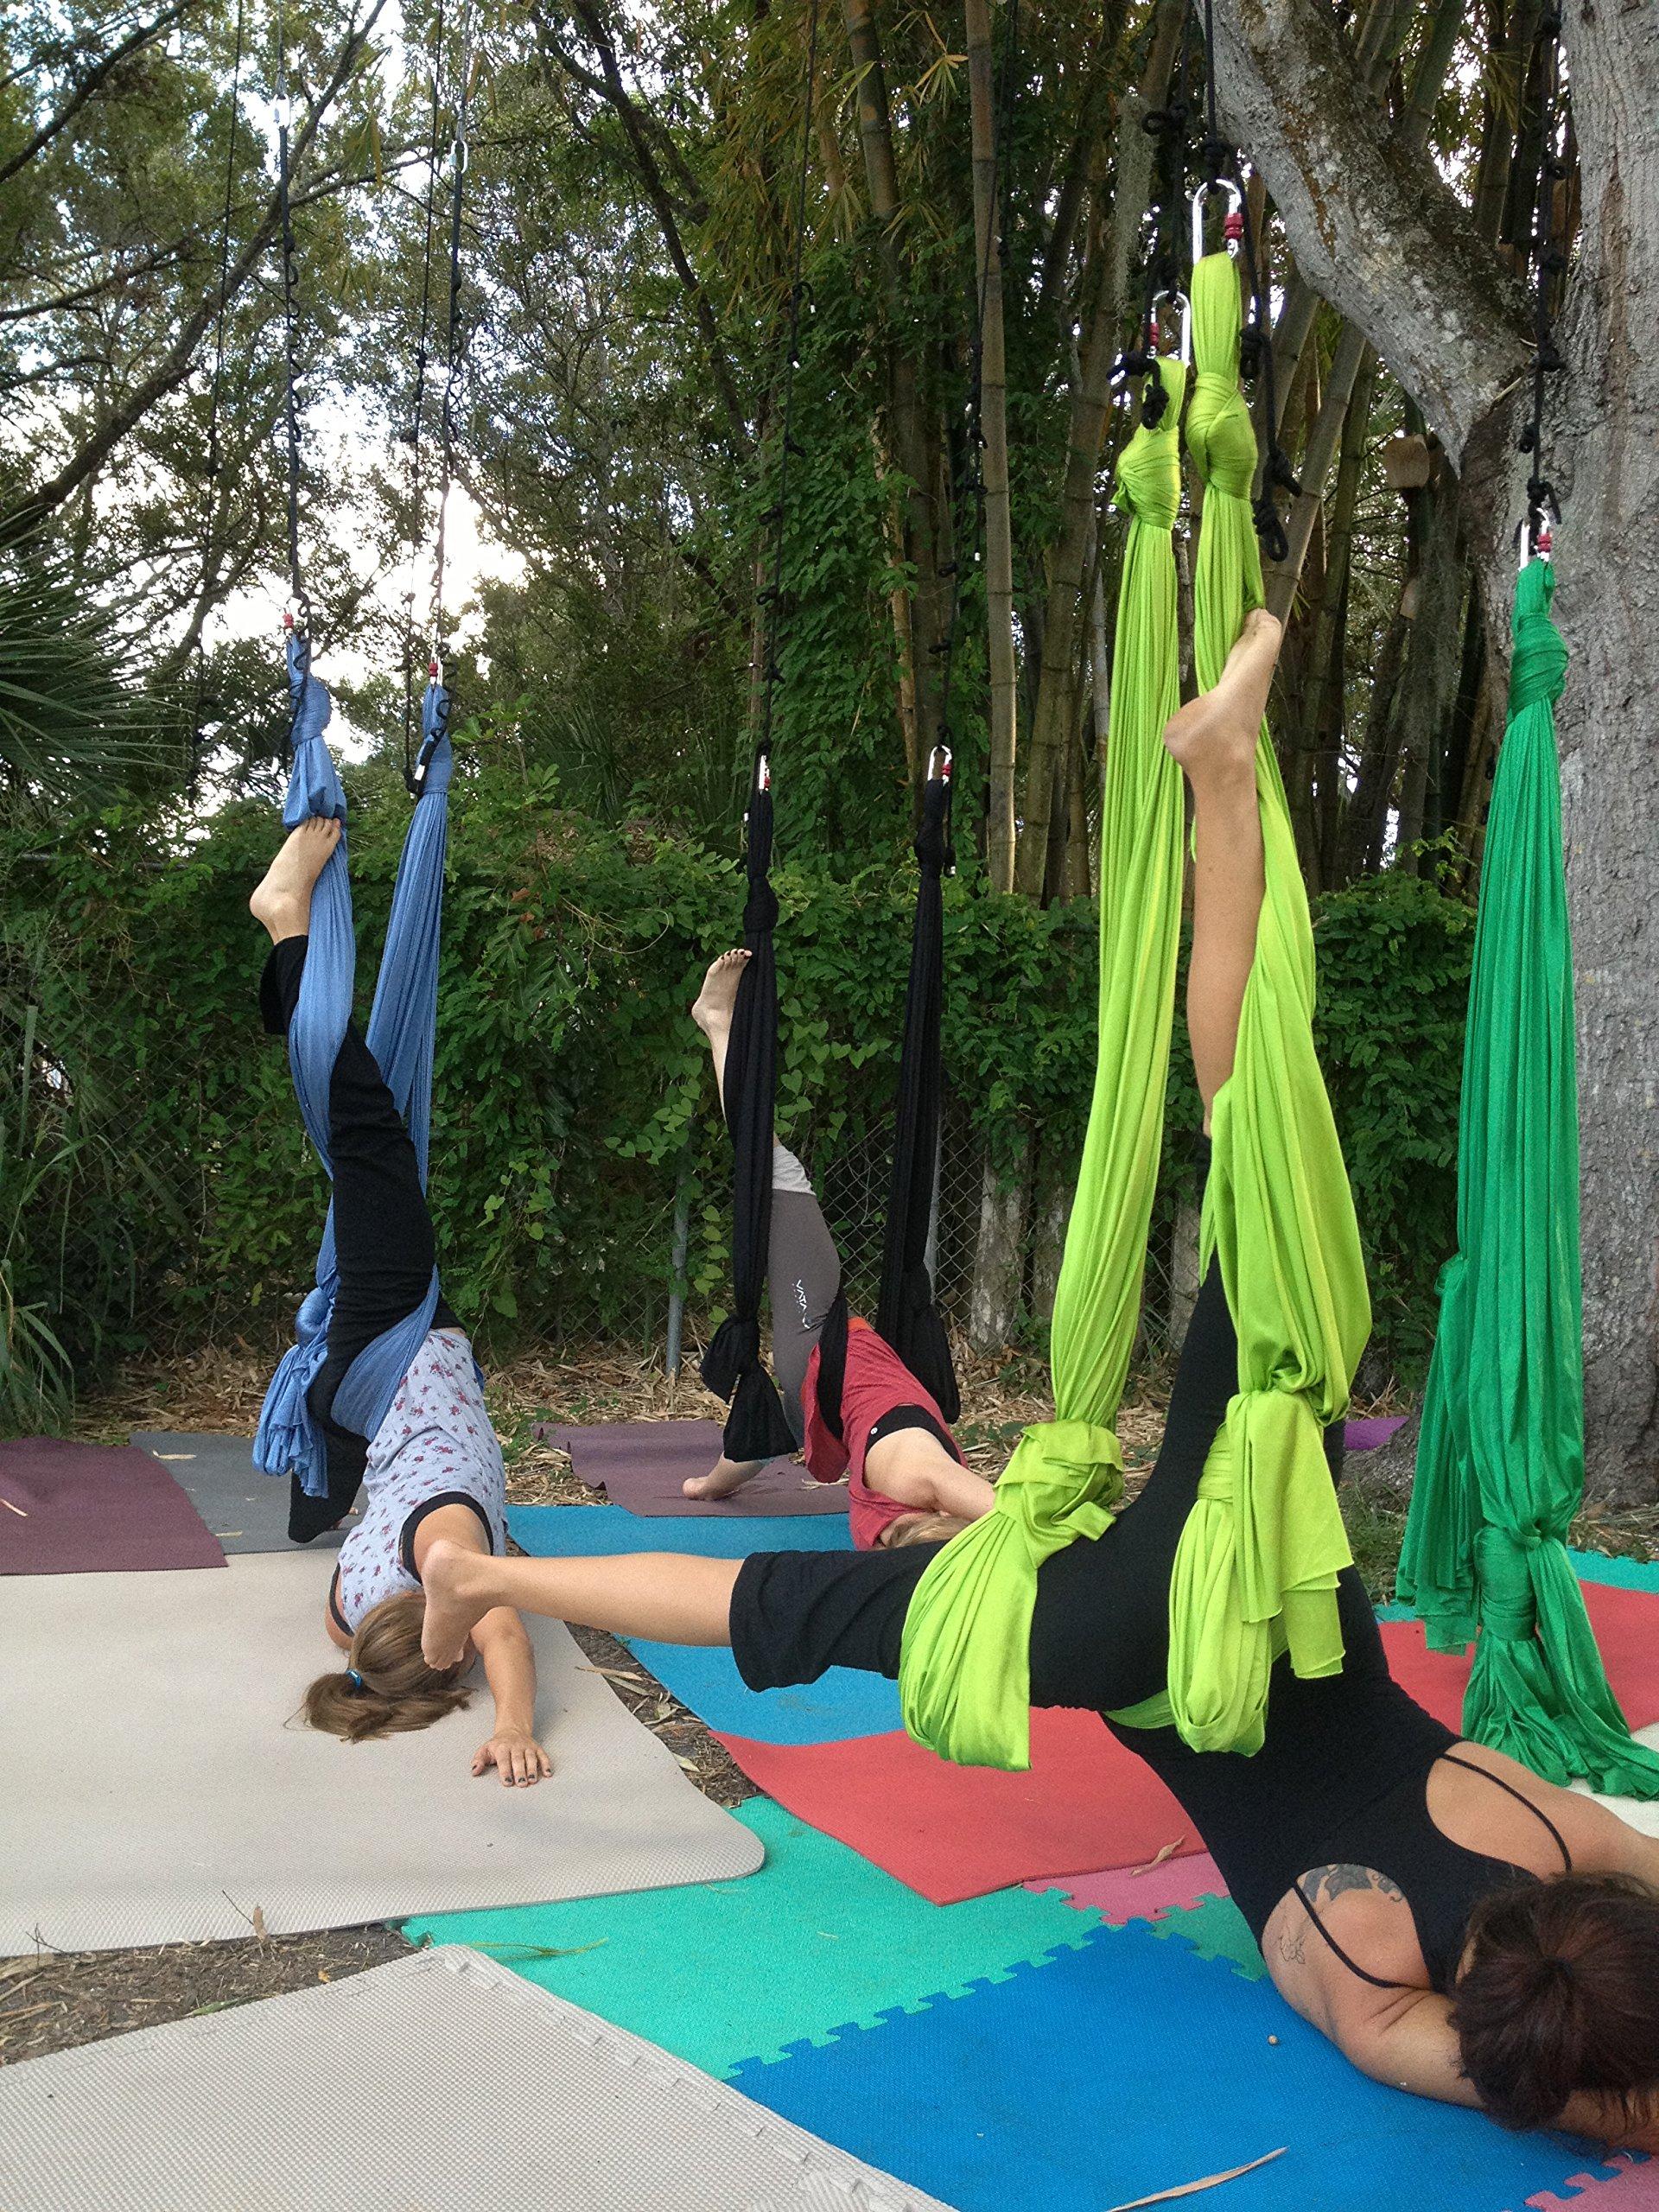 Deluxe Aerial Yoga Hammock (Yoga Swing or Sling, Aerial Yoga) (Lemon Lime)